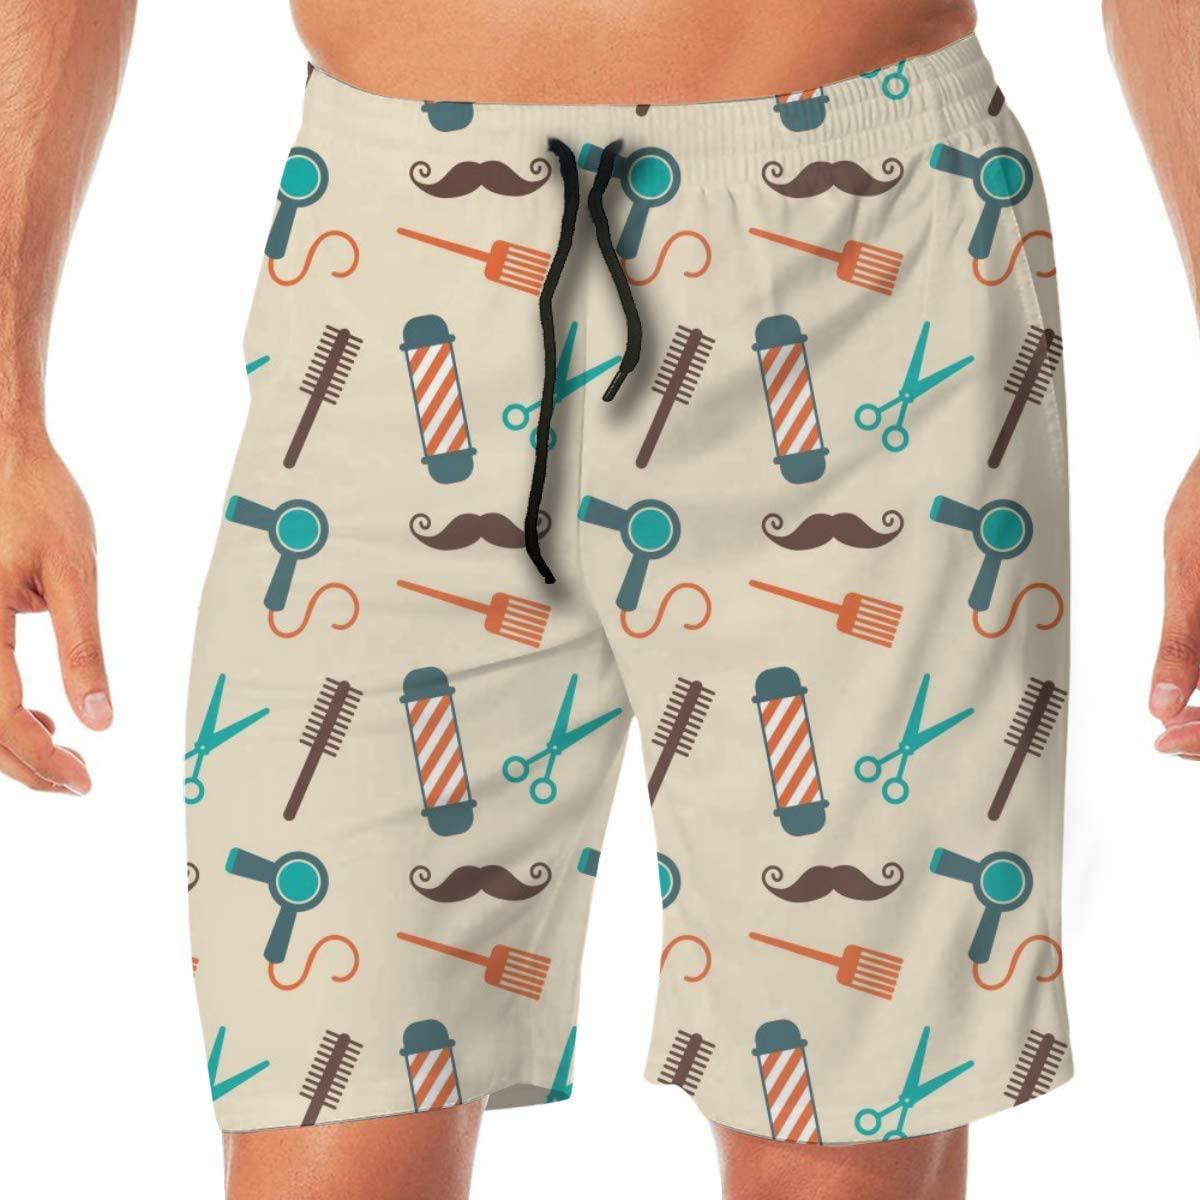 Men's Bathing Suit Swim Trunks Quick Dry Beach Shorts for Beach Gym Hiking